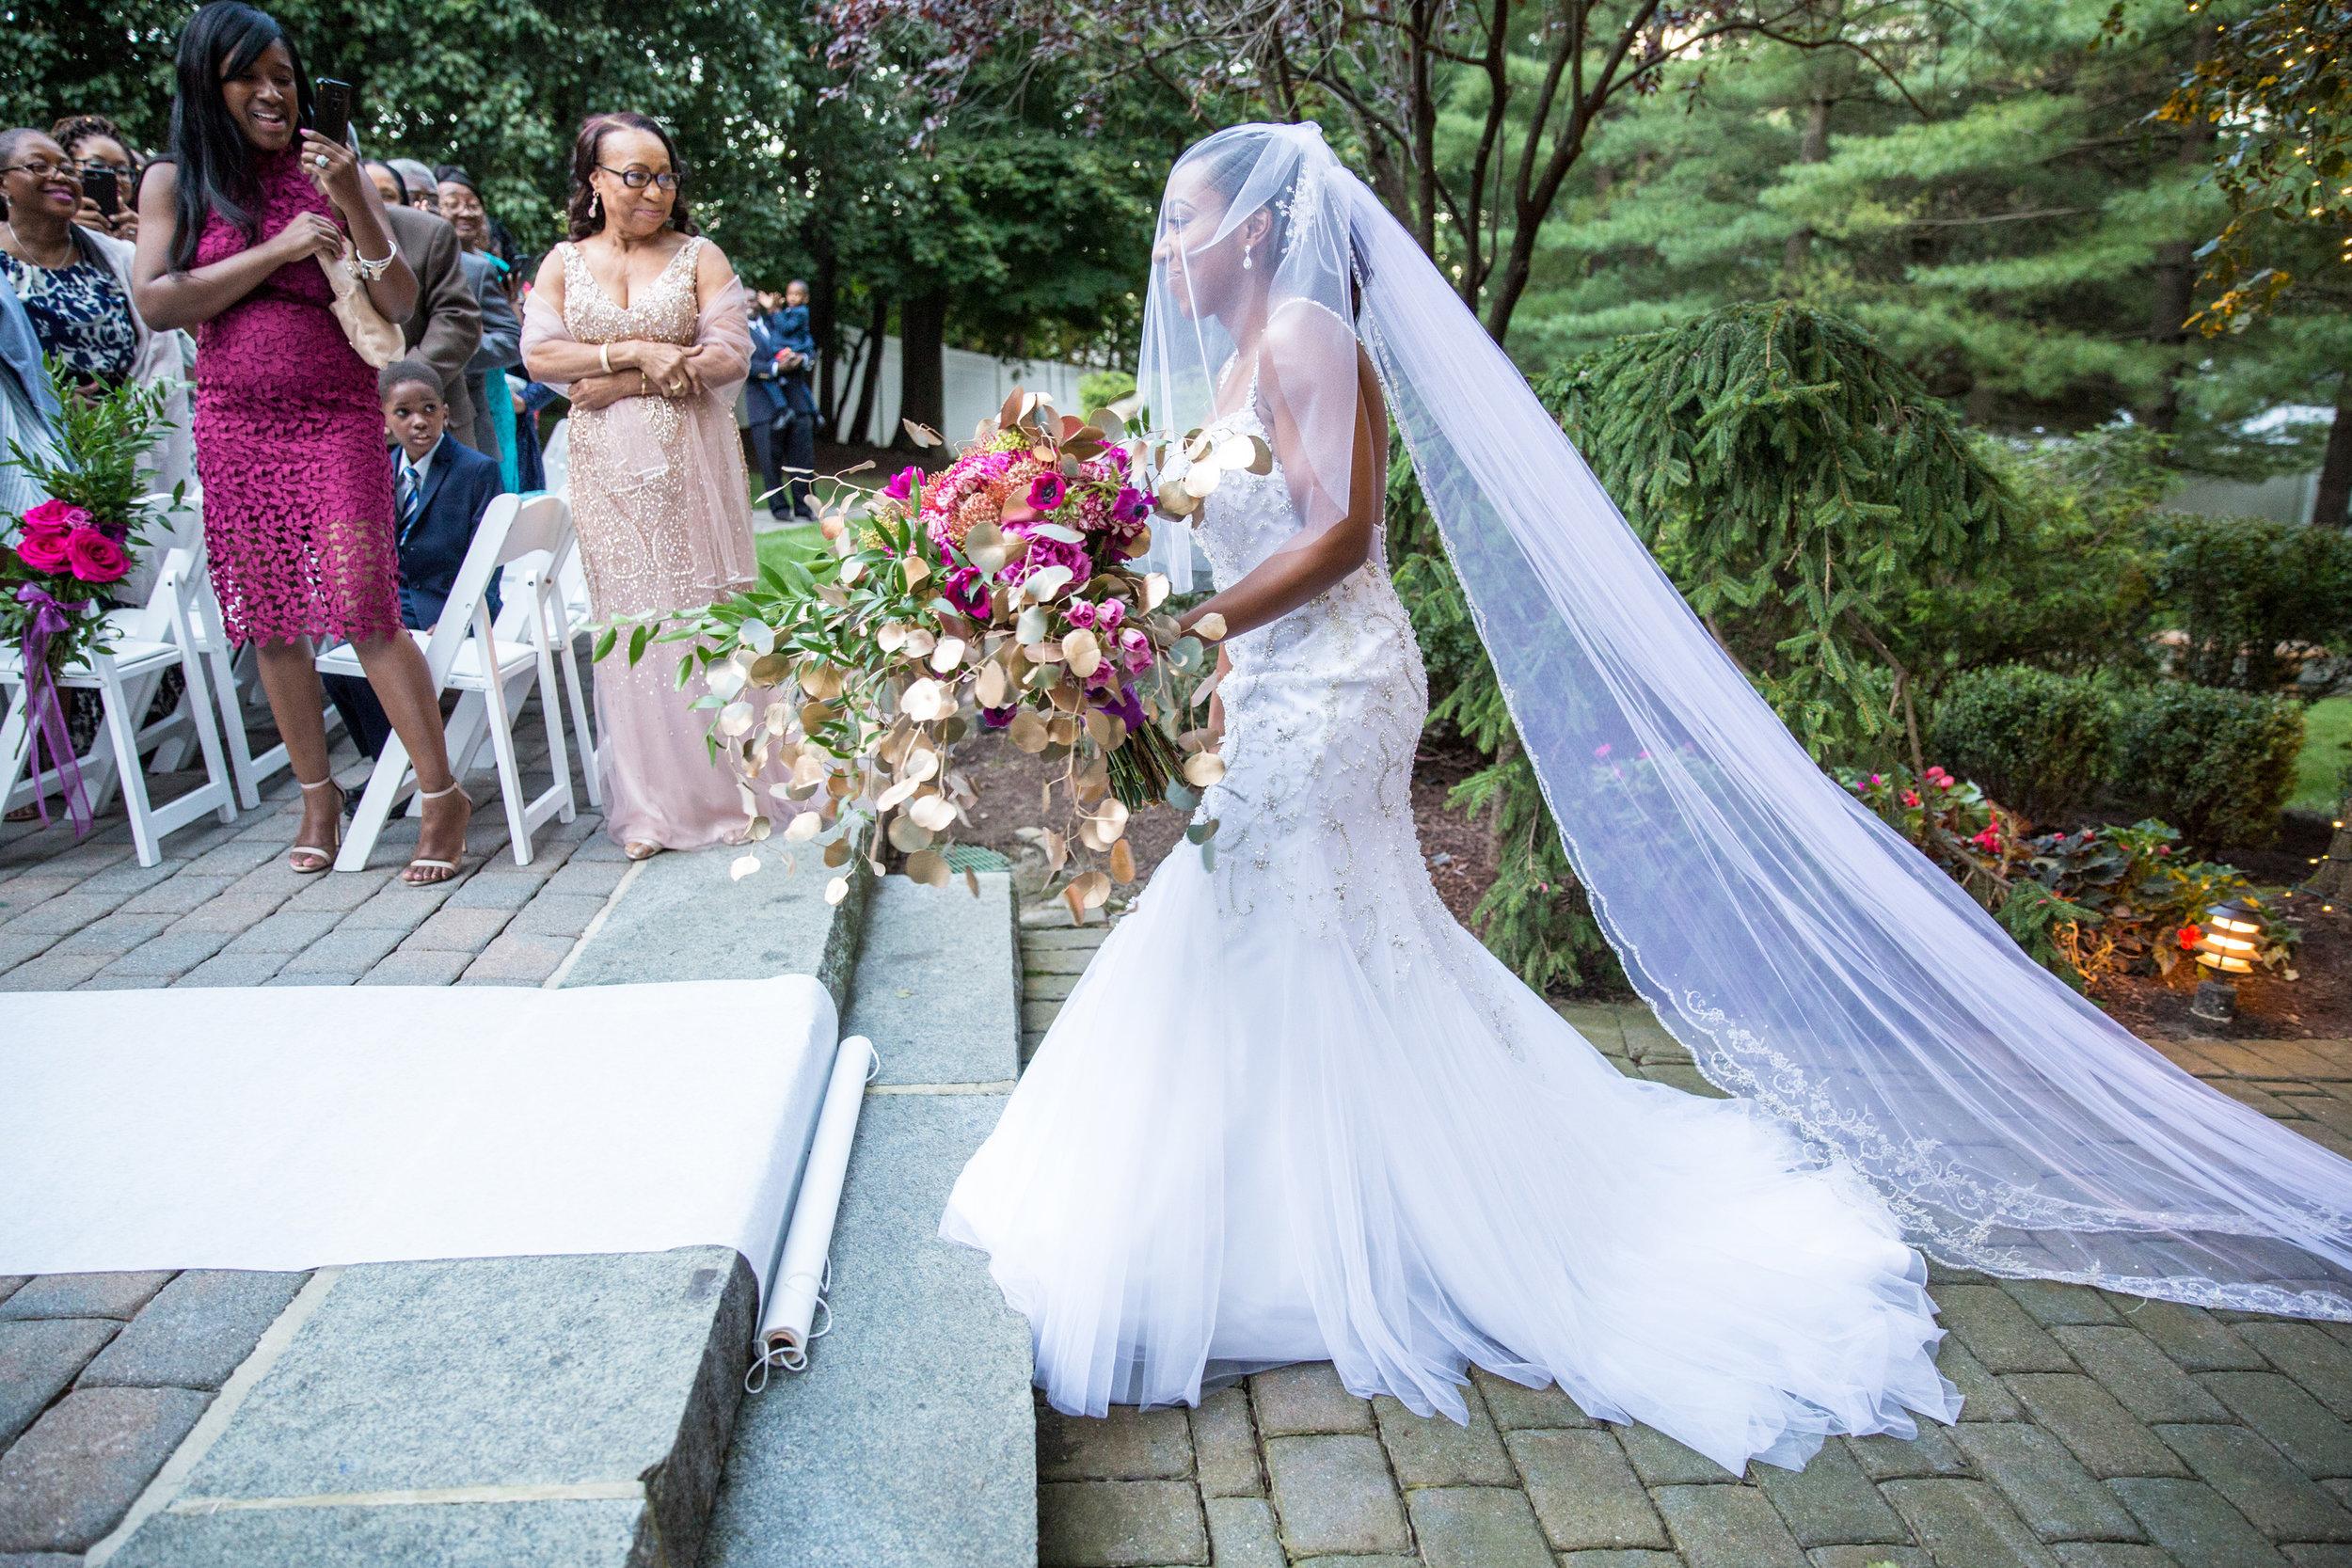 victorious-events-nyc-017-romie-kamali-tides-estate-wedding-nana-annan.jpg